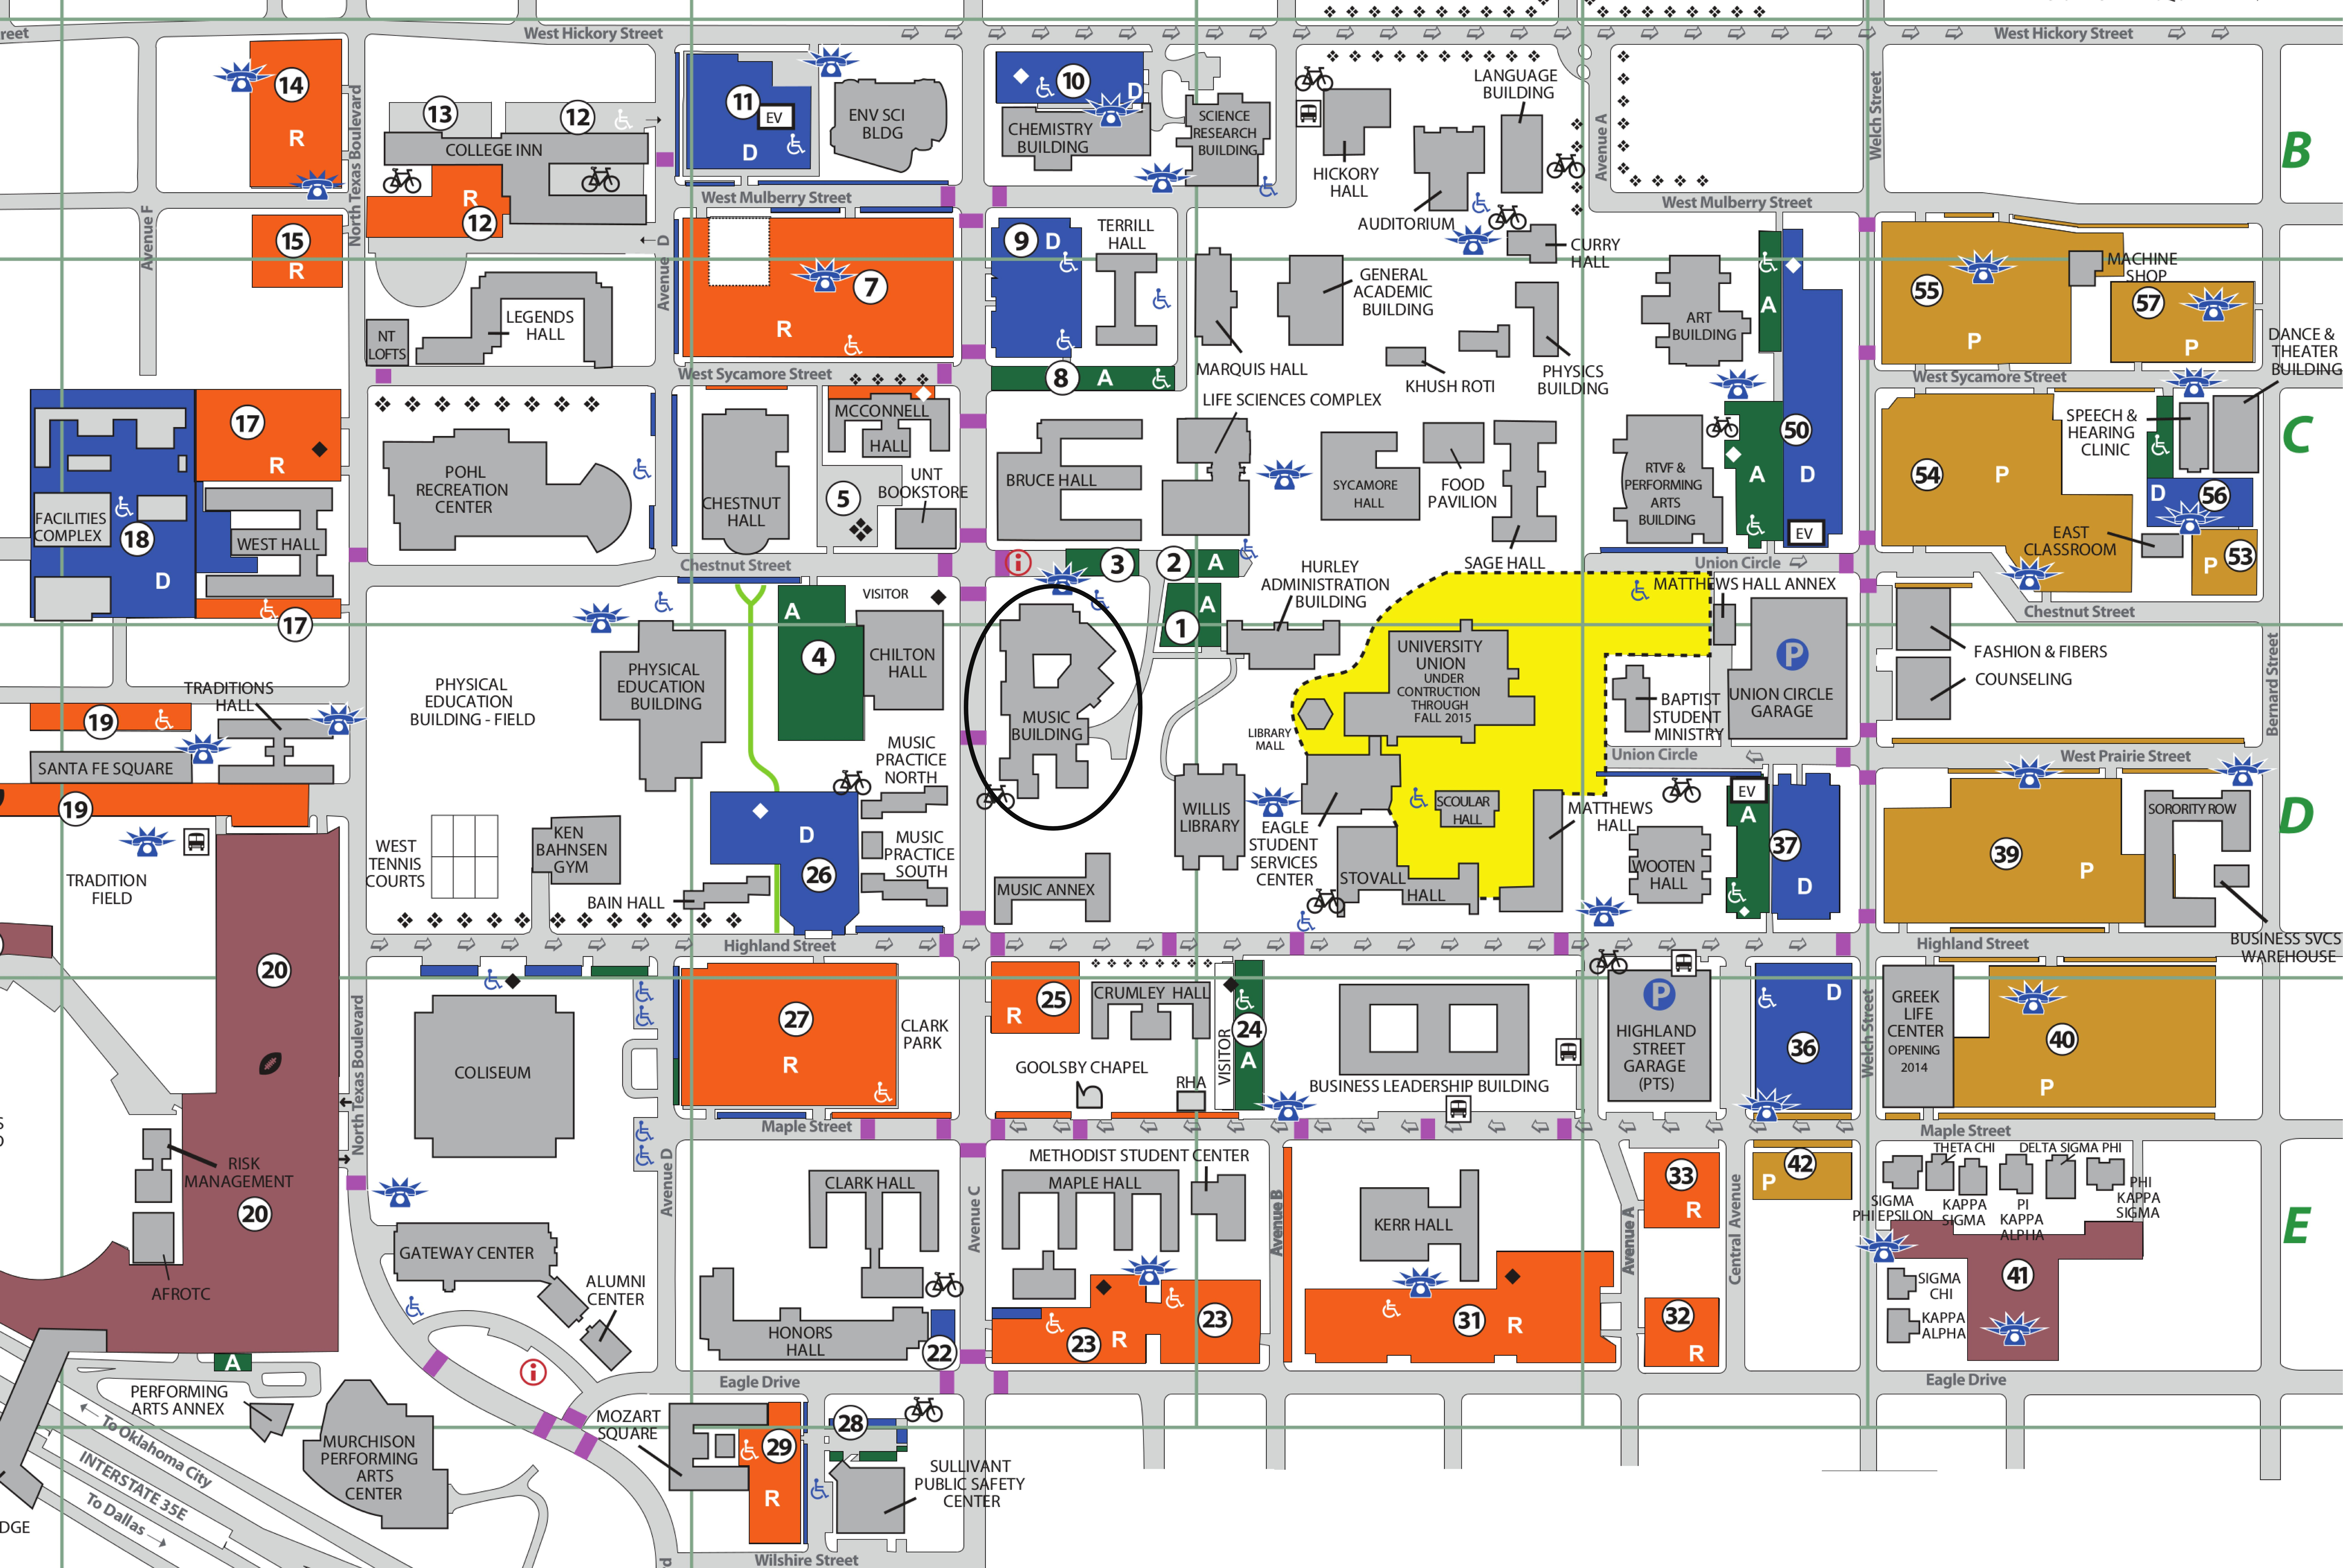 unt parking map unt dallas map university of north texas dallas  - index of images unt map